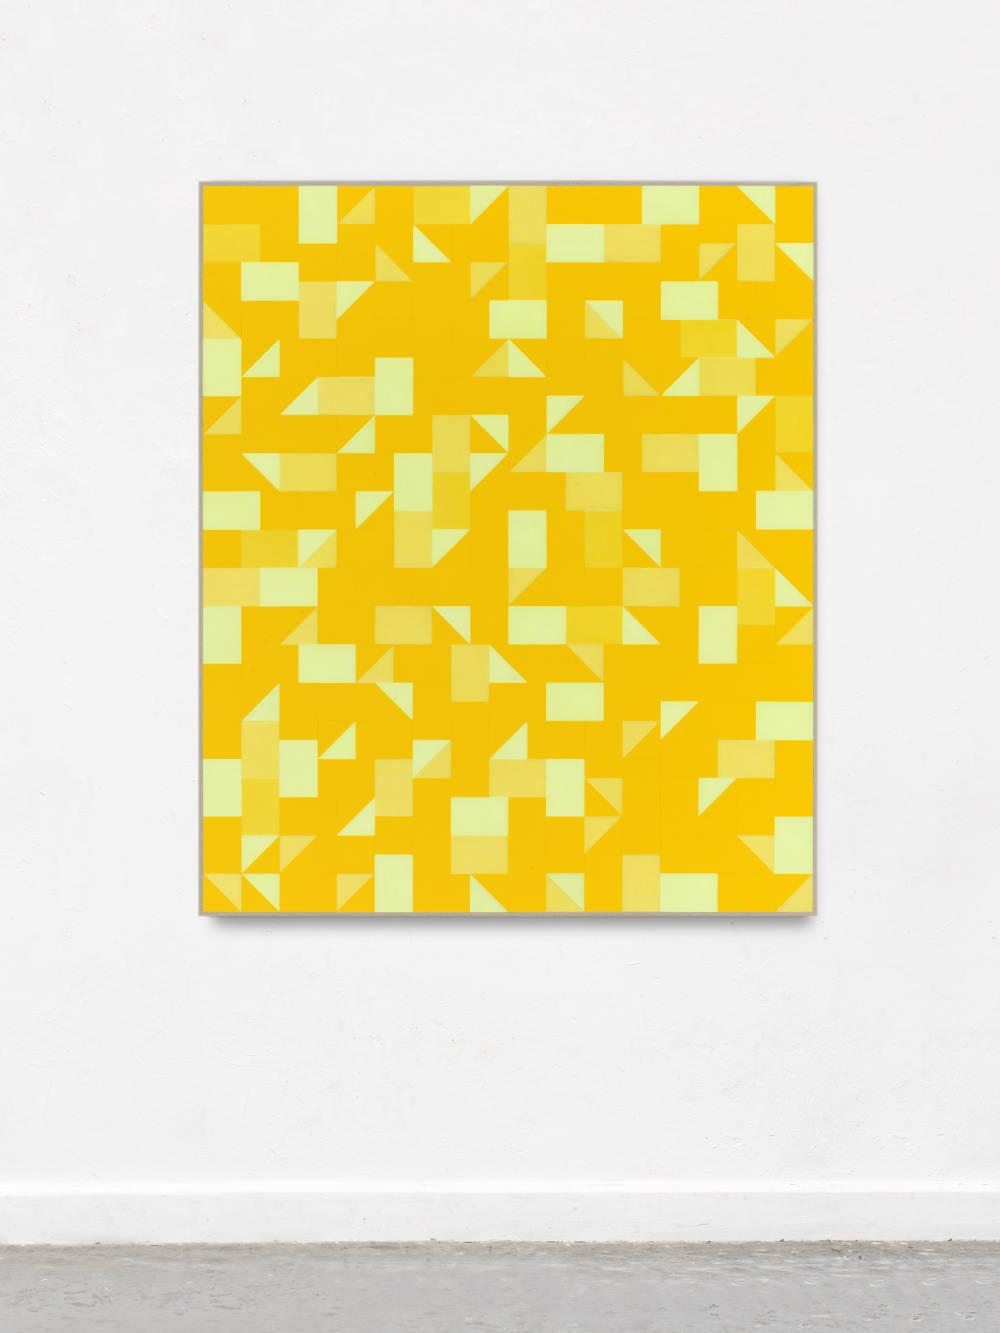 Gregor Hildebrandt, Mit Henkeln aus Nephrit, 2018. Cut vinyl records, acrylic, canvas, wood 154 x 130 cm, 60.6 x 11.8 in. Courtesy of the artist and Perrotin.